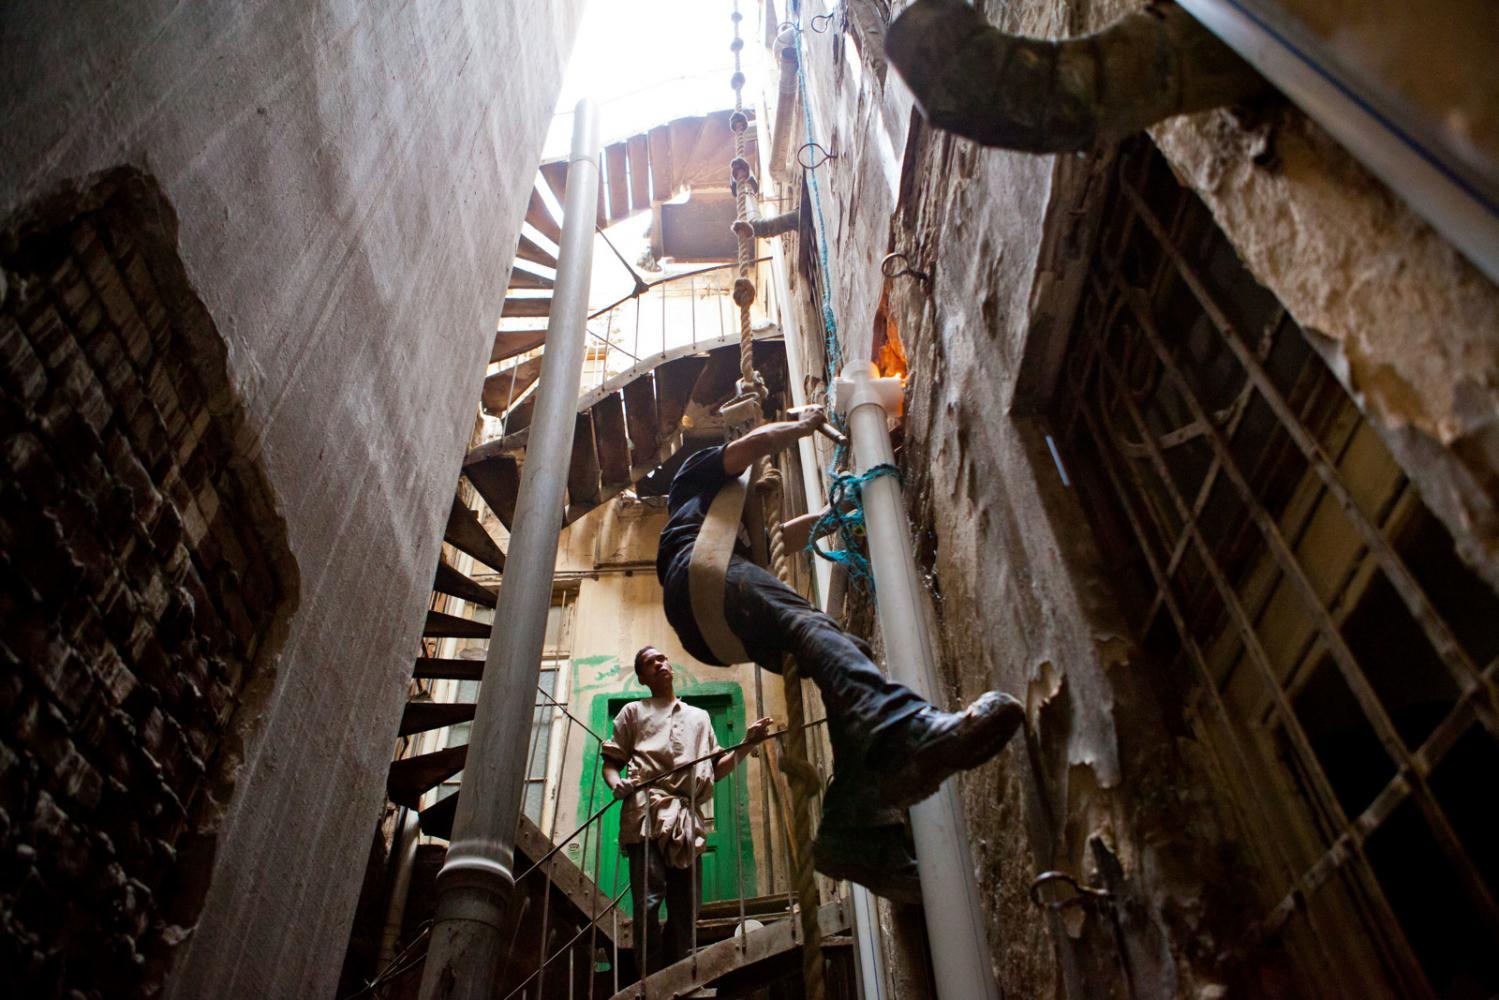 Water pipe repair in Cairo, Egypt